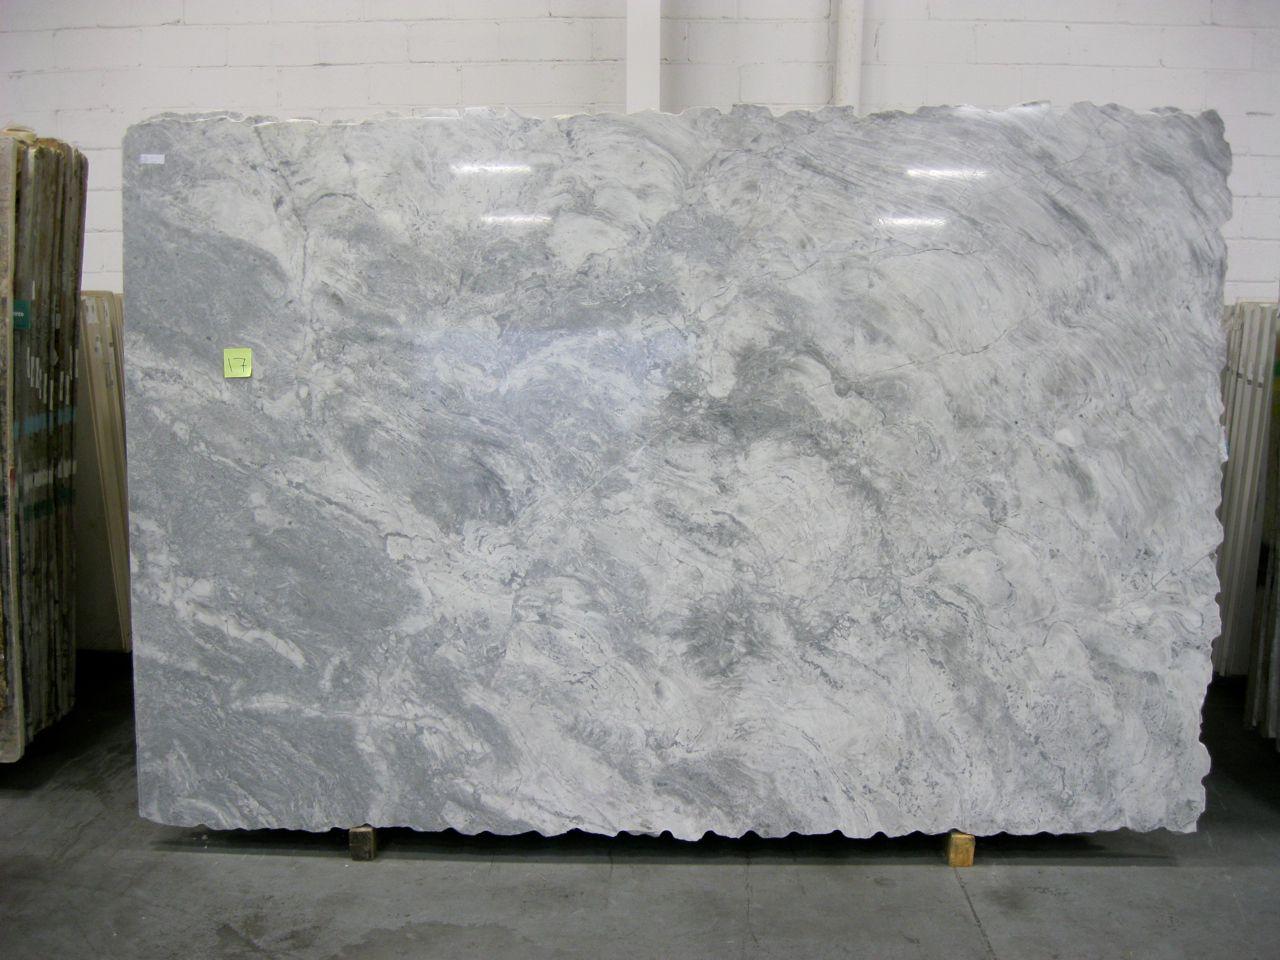 White Fantasy Quartzite Granite Countertop Sink Ideas Pinterest Granite Engineered